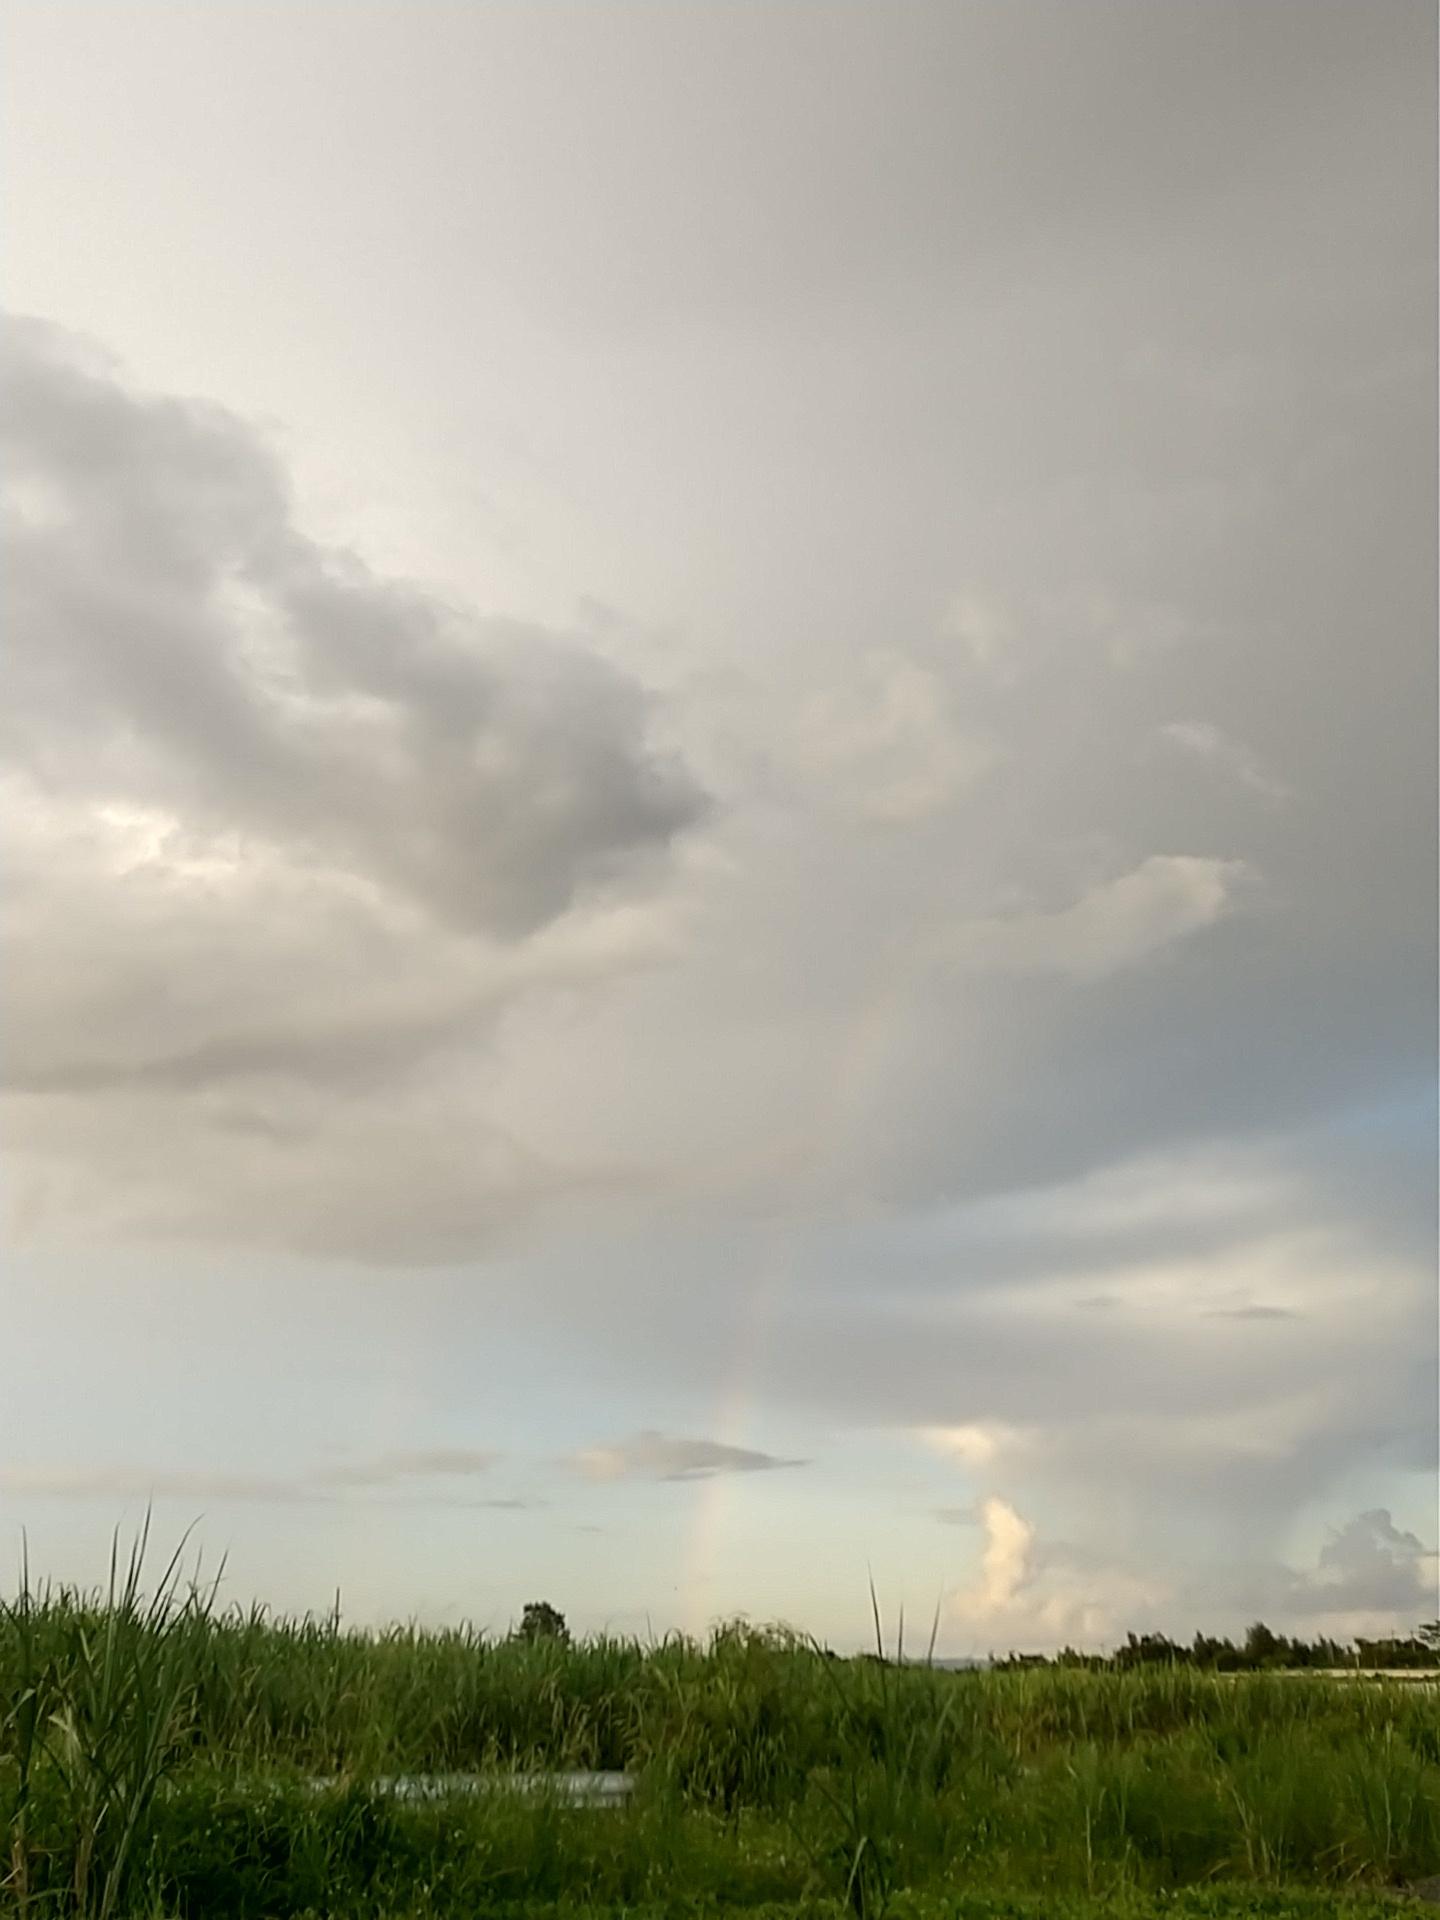 雲。虹。夕陽。夕焼け。_e0251855_19433608.jpg